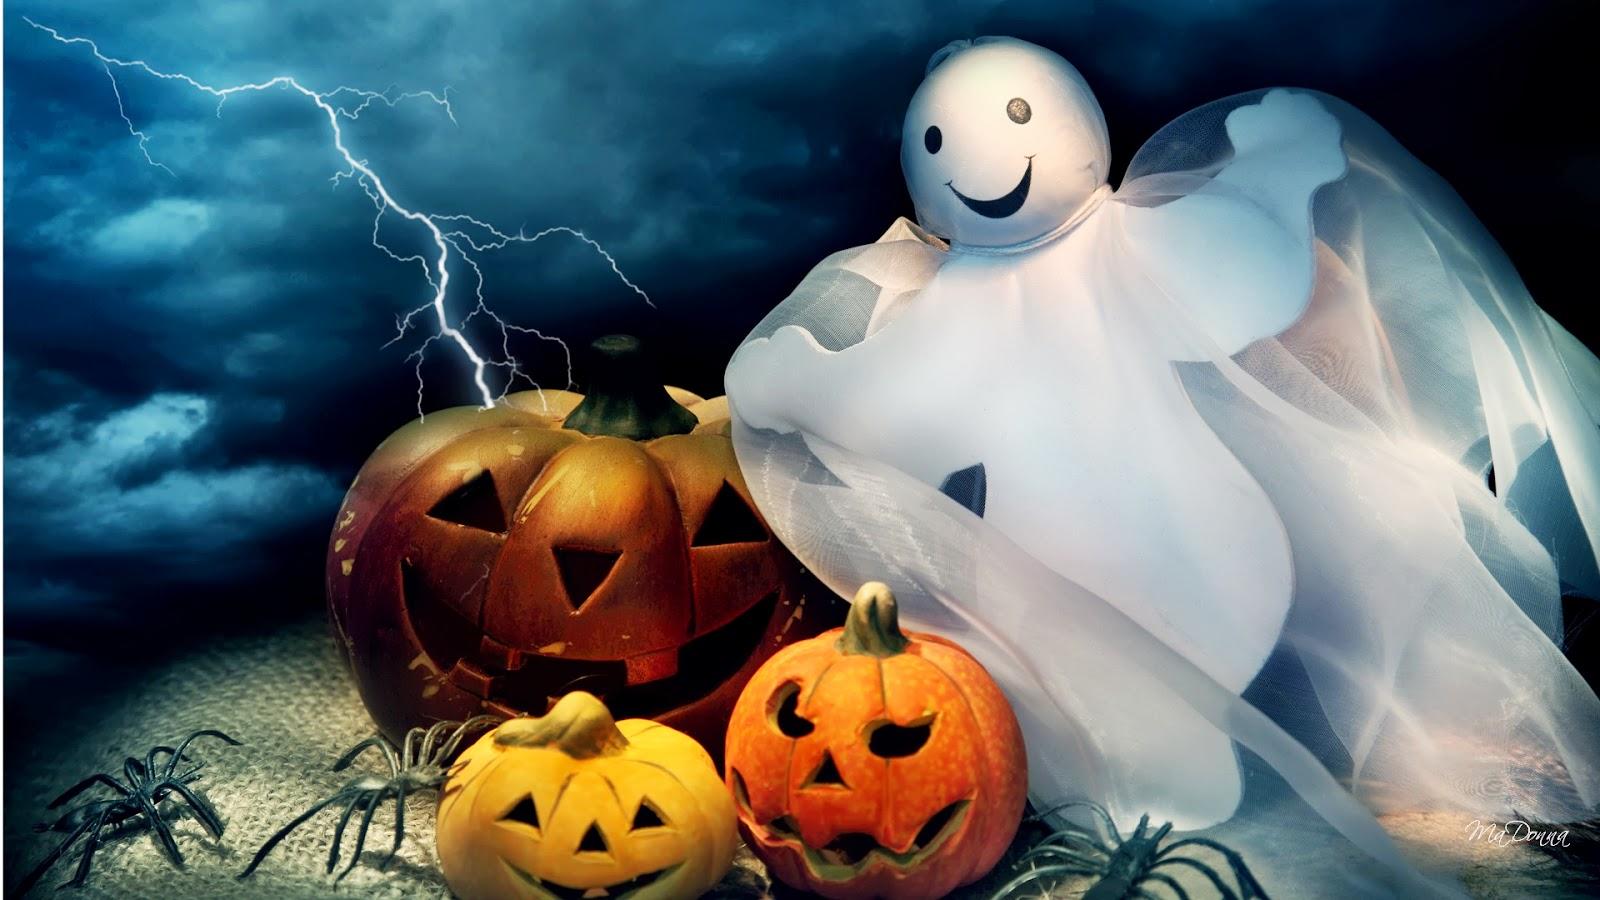 free halloween desktop wallpaper   Video Search Engine at 1600x900